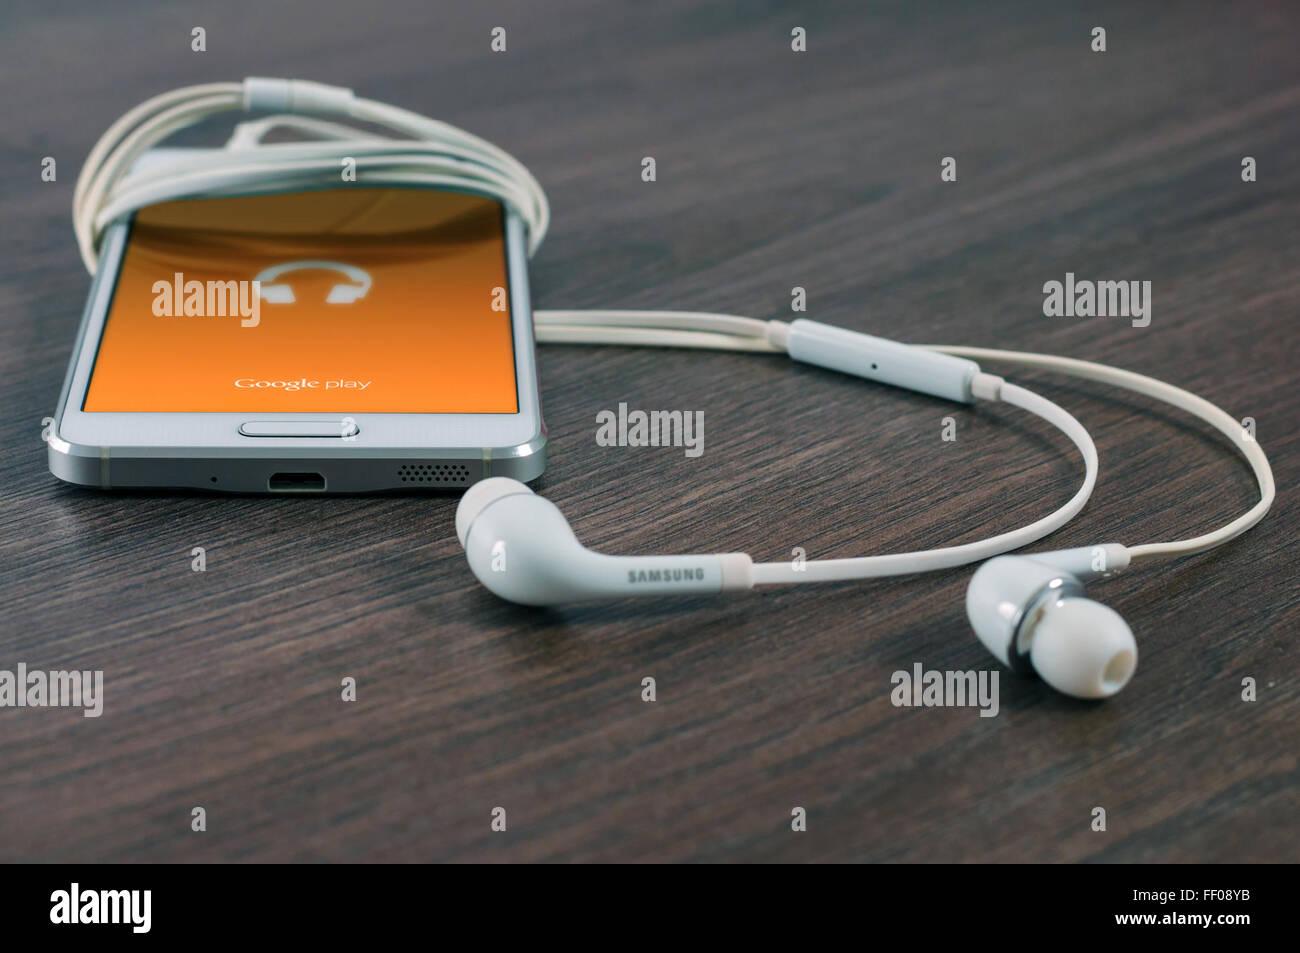 Smartphone with Earbuds Smartphone with Earbuds - Stock Image